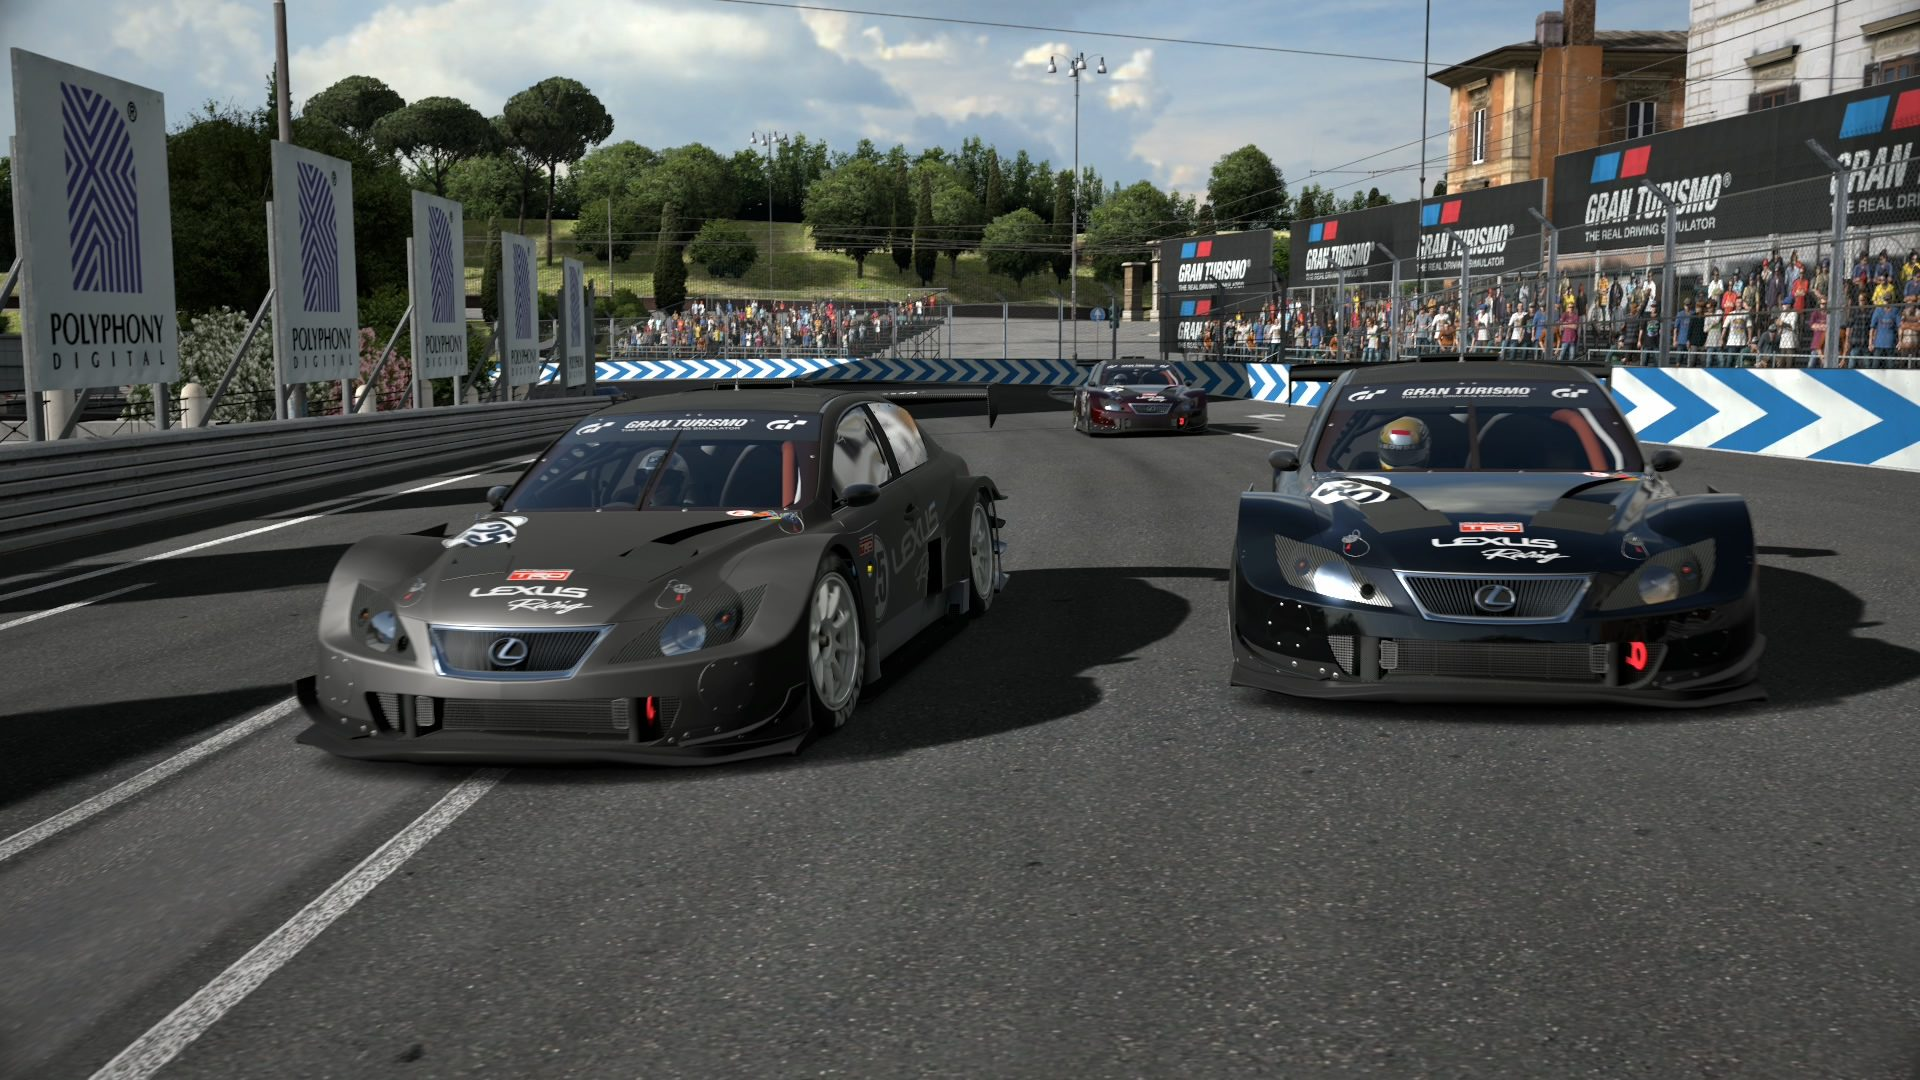 Circuito di Roma_21.jpg